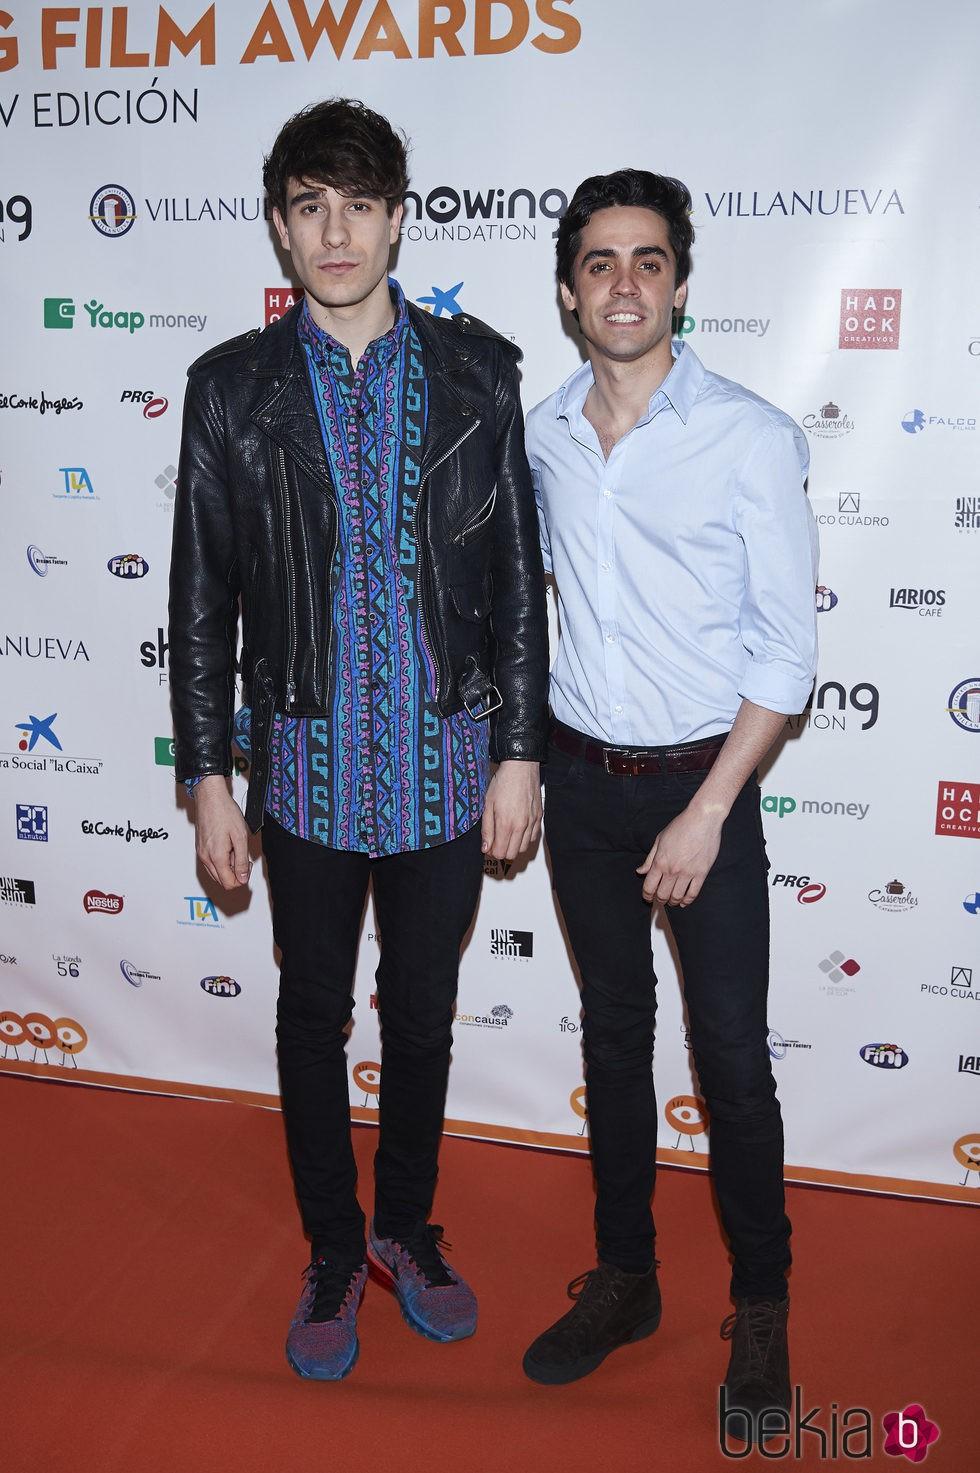 ¿Cuánto mide Javier Ambrossi? (Los Javis) - Altura 73853_javier-calvo-javier-ambrossi-showing-film-awards